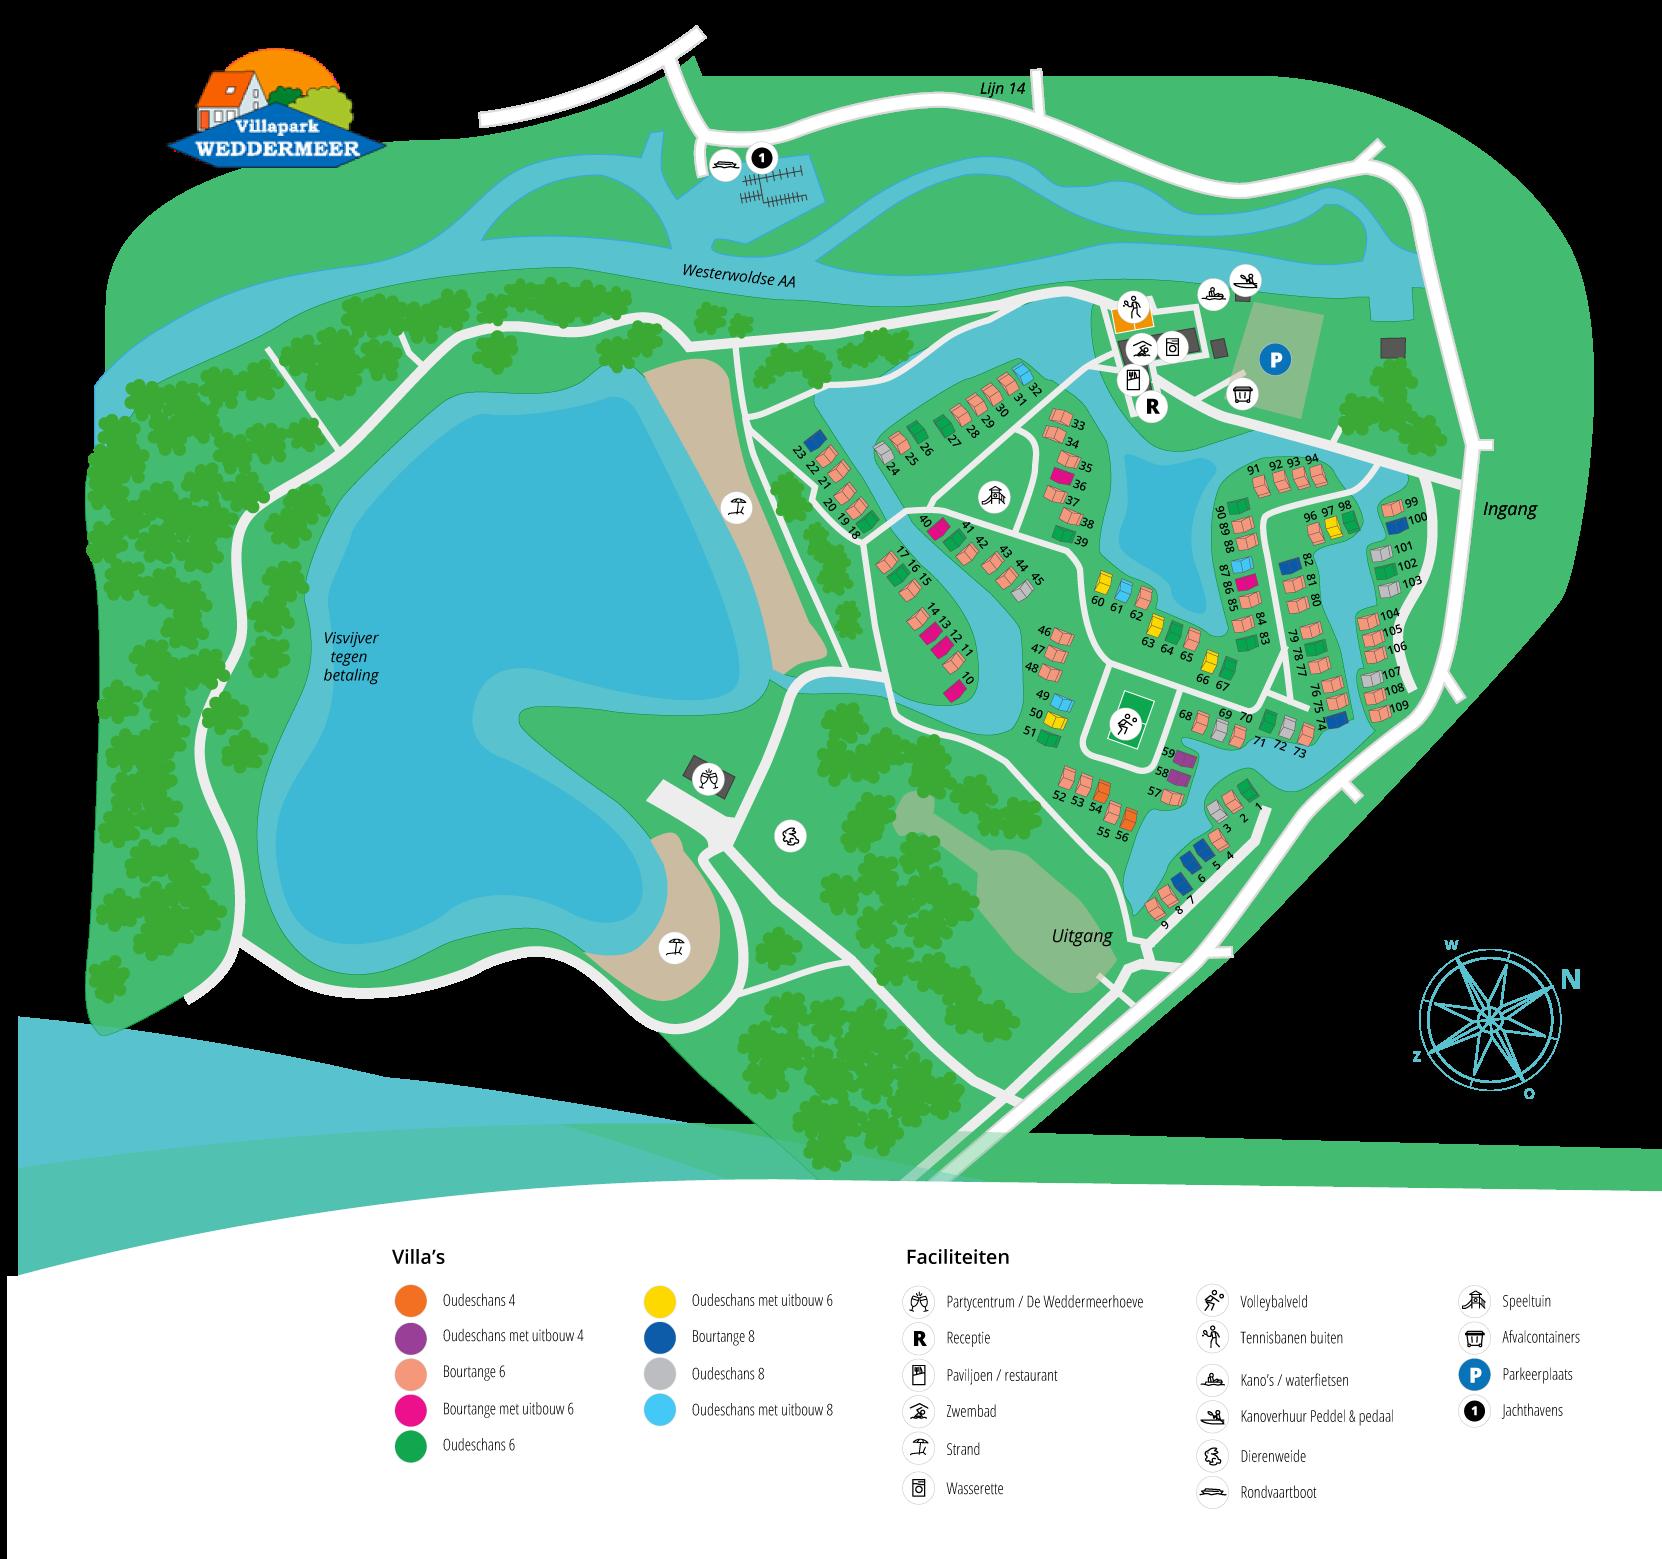 plattegrond villapark weddermeer